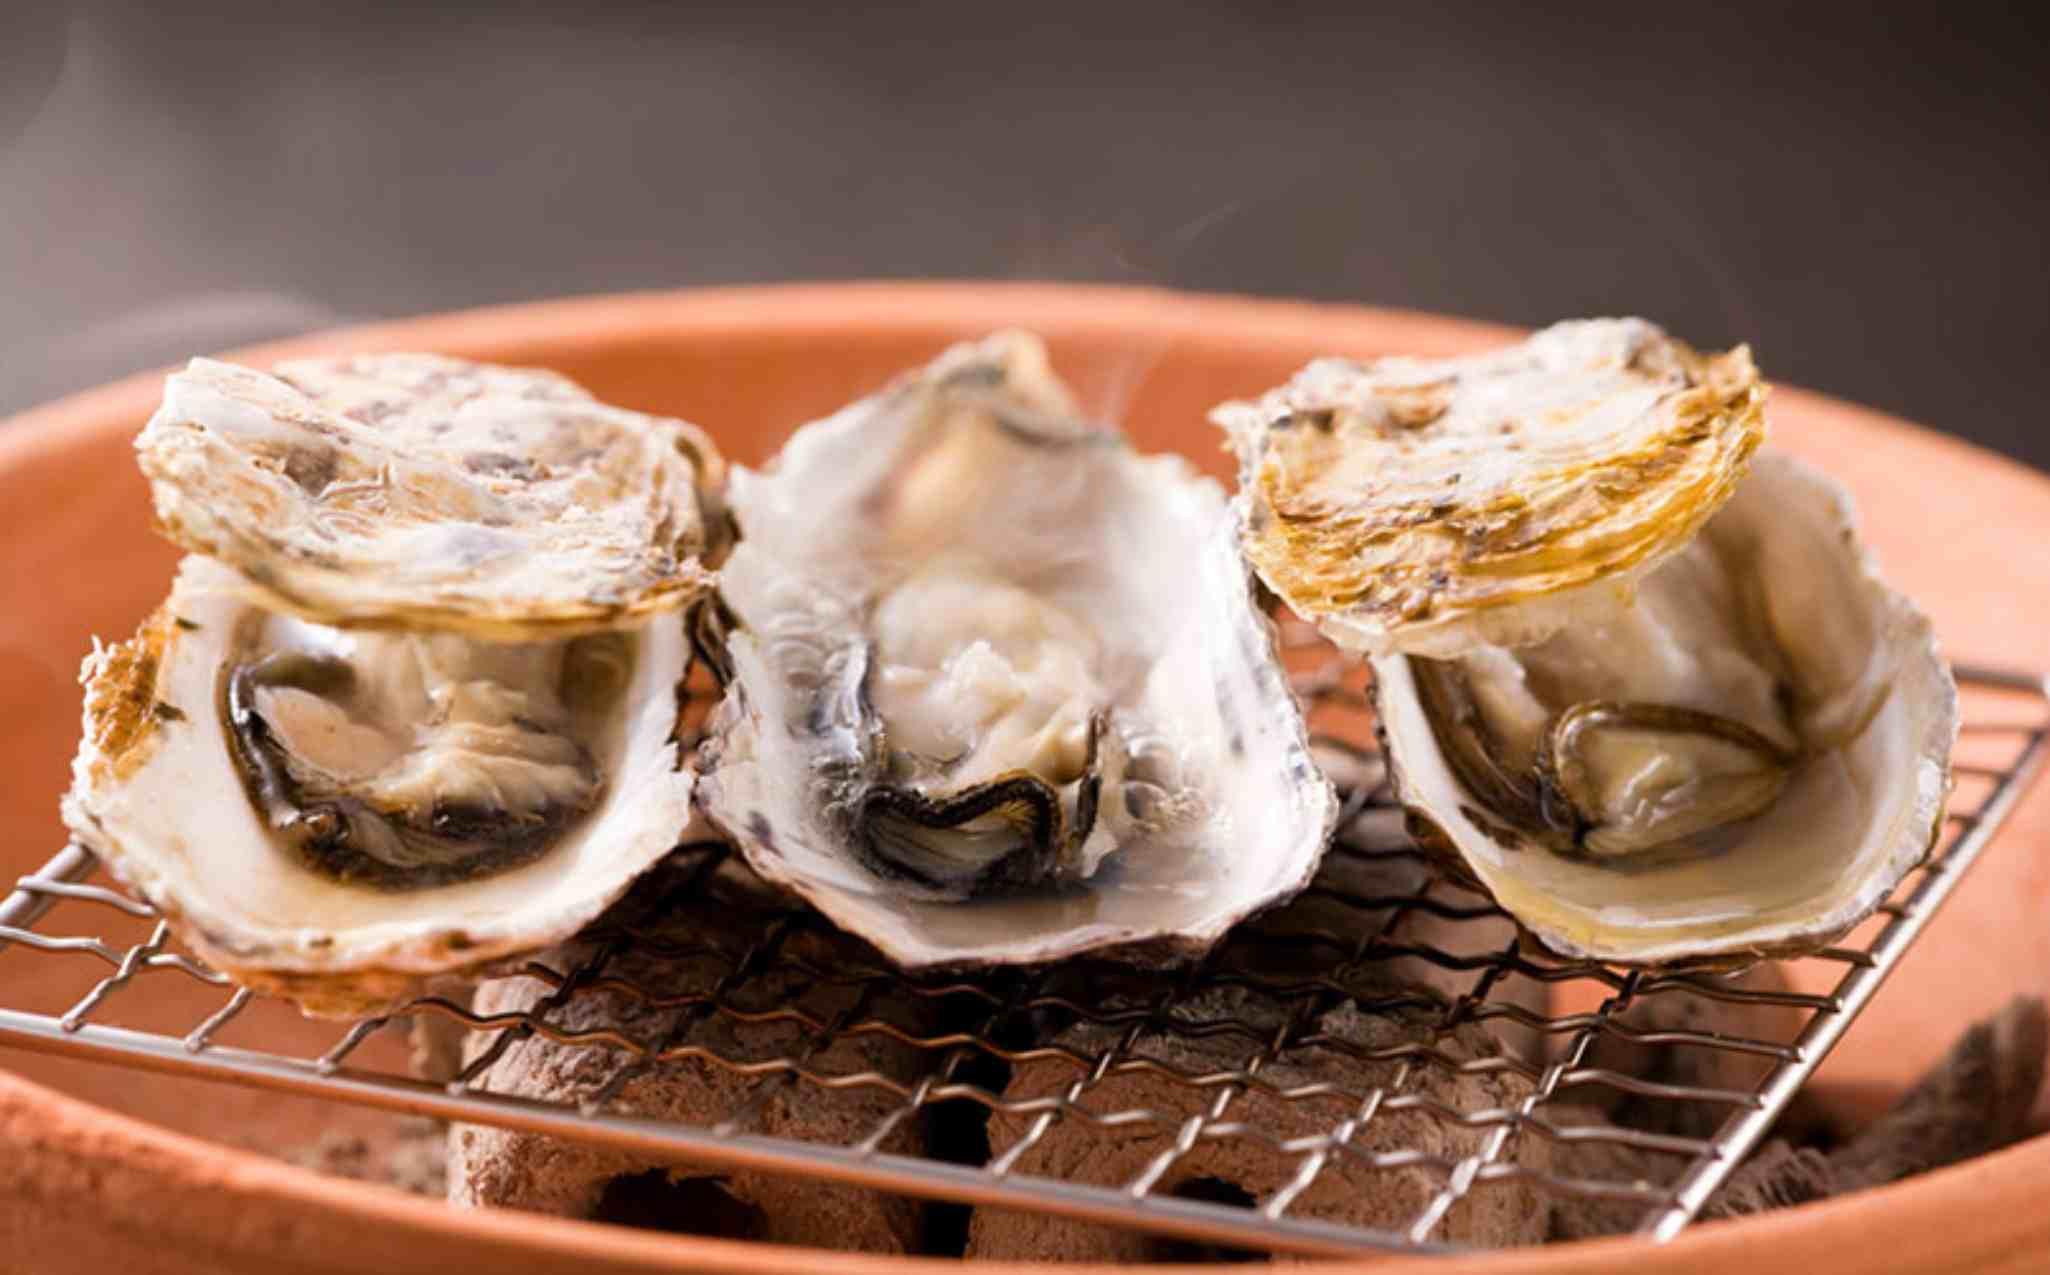 Seto Inland Sea Oyster